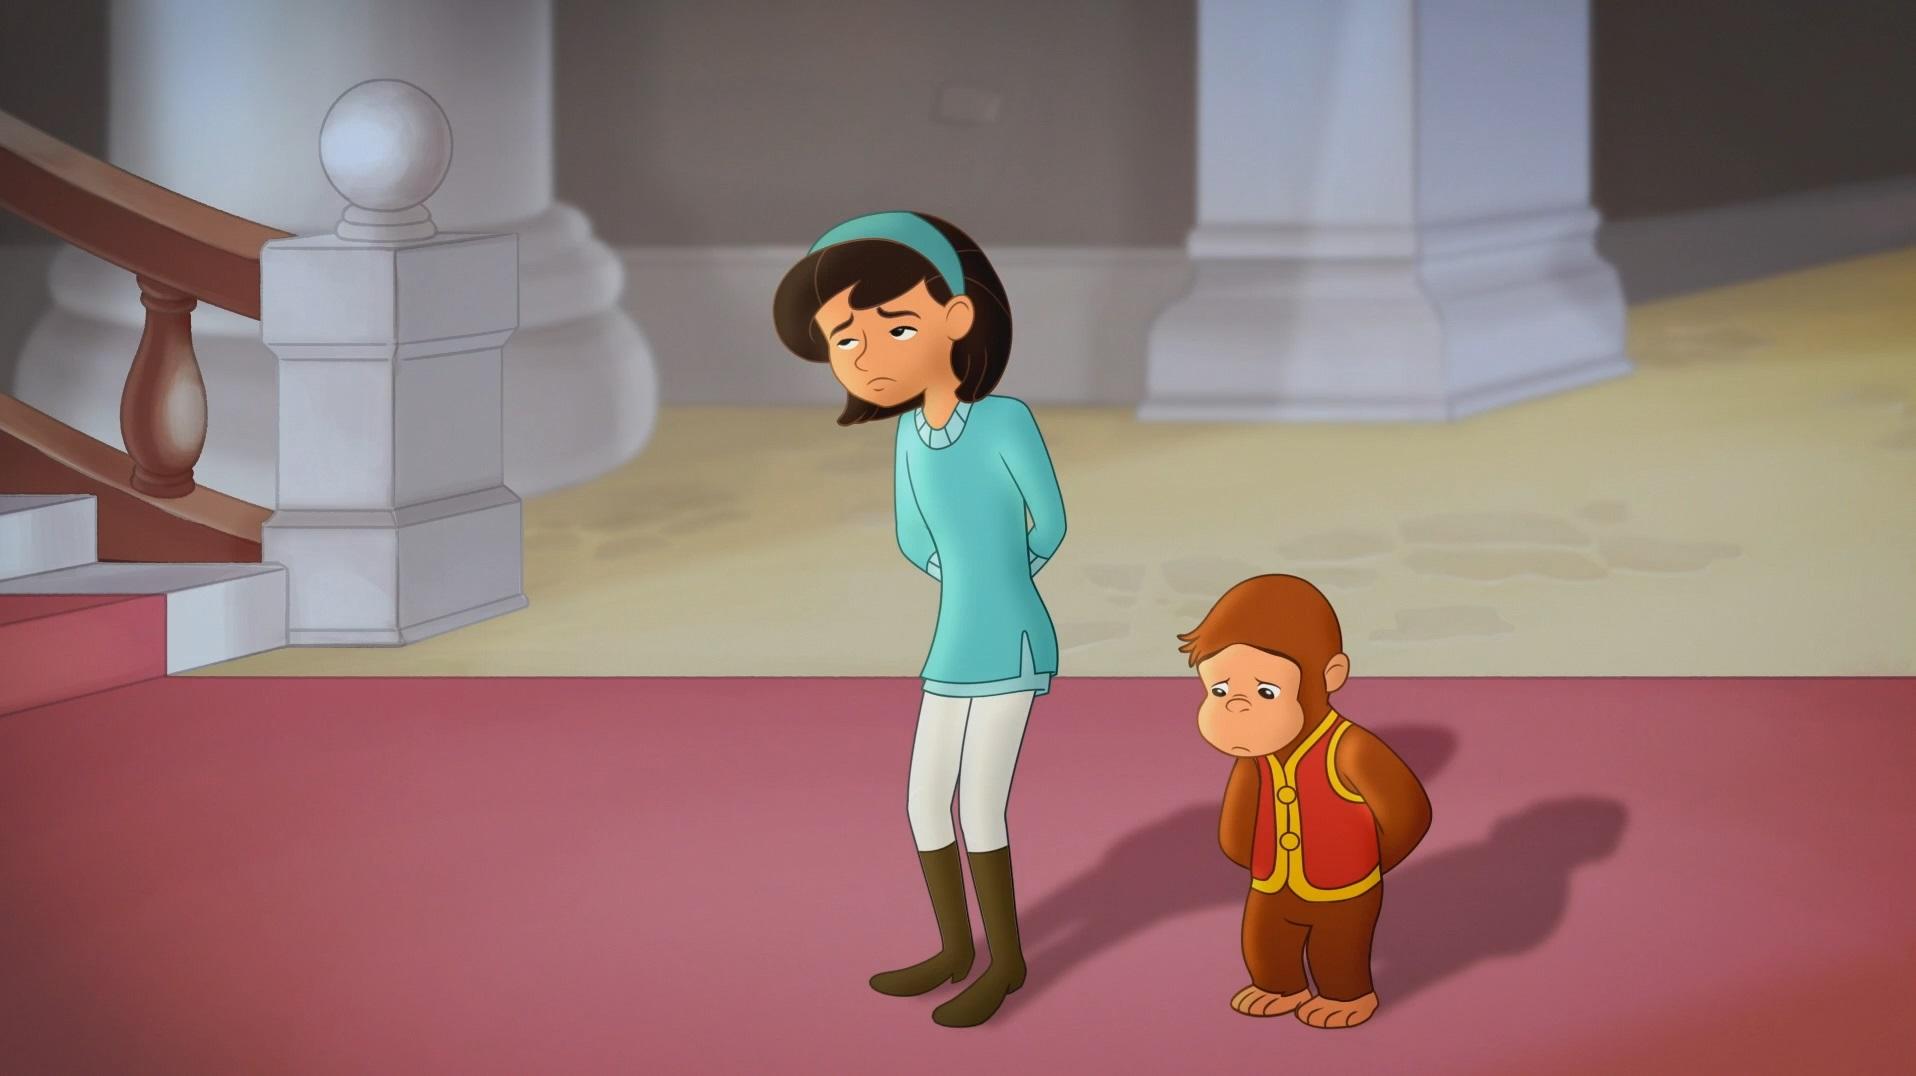 Meraklı Maymun Sarayda | Curious George: Royal Monkey | 2019 | WEB-DL | XviD | Türkçe Dublaj | m720p - m1080p | WEB-DL | Dual | TR-EN | Tek Link